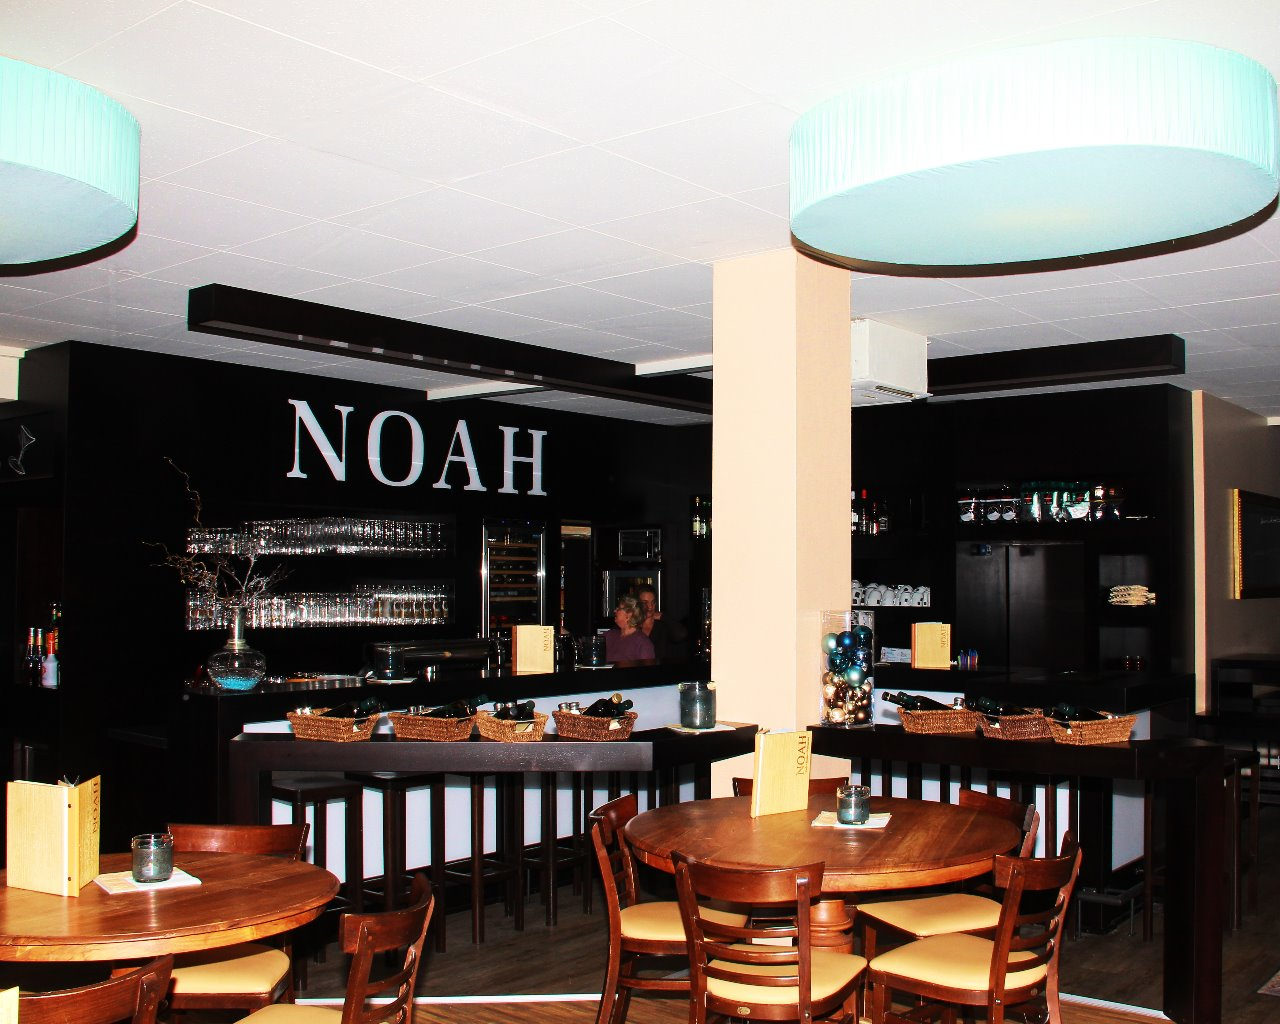 Cafe Noah cafe bistro noah